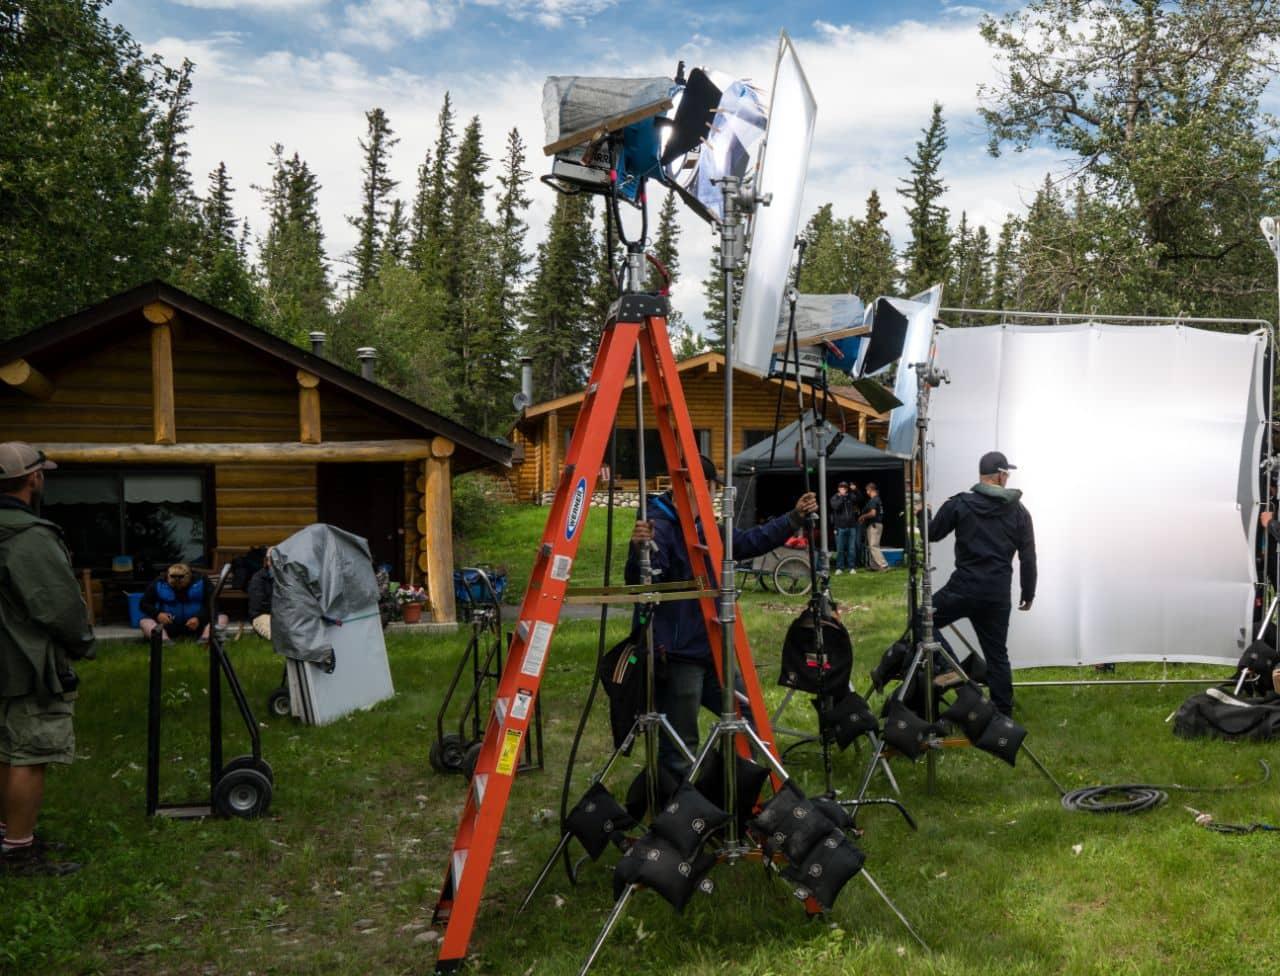 Heartland Season 12 Filming is Nearly Done - Heartland